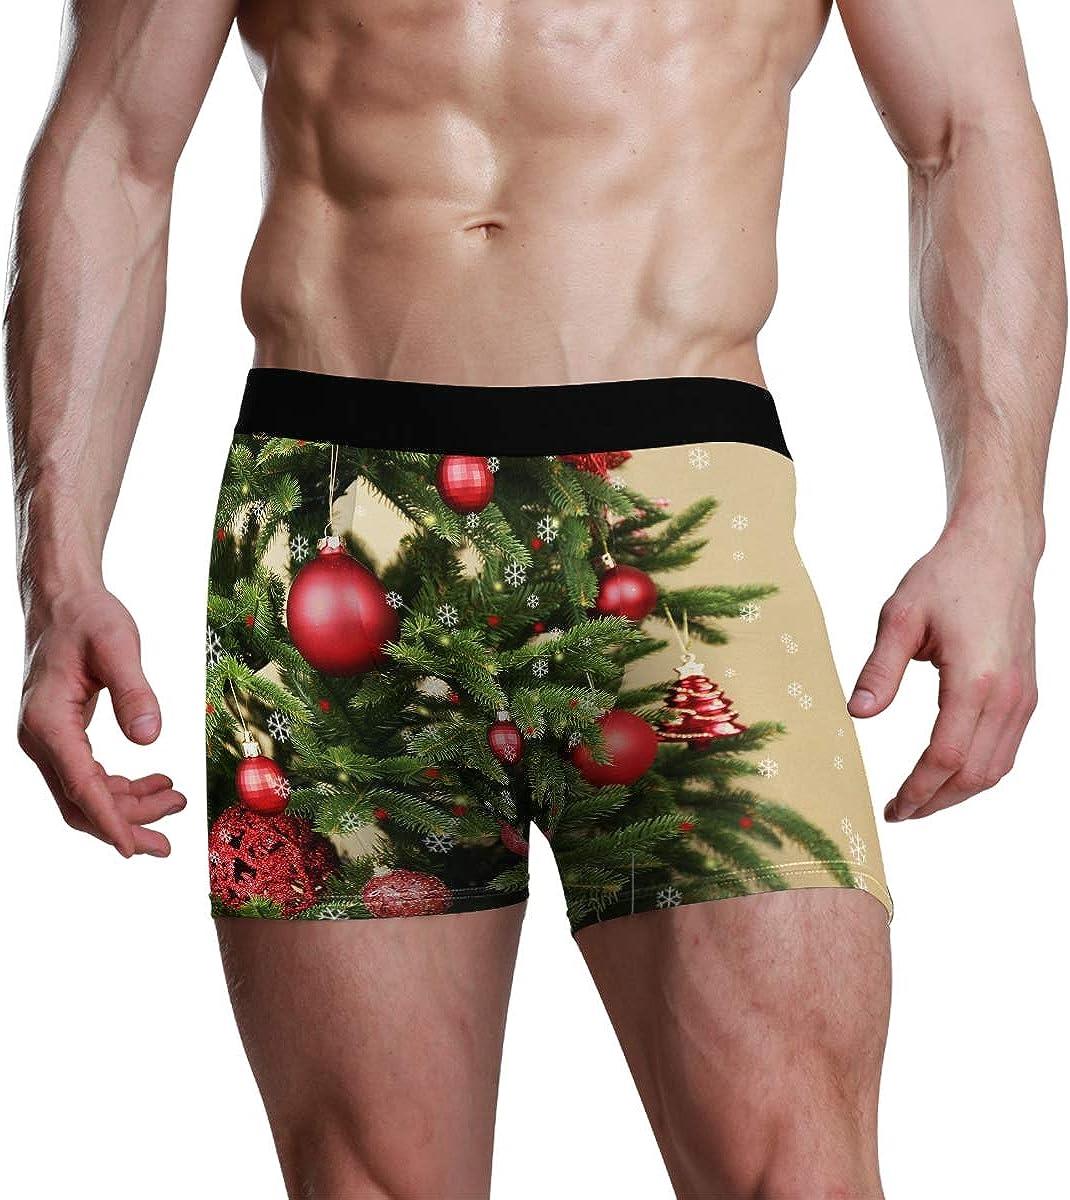 HangWang Mens Underwear Briefs Decorated Christmas Tree Closeup Breathable Long Boxer Briefs Underwear Boys